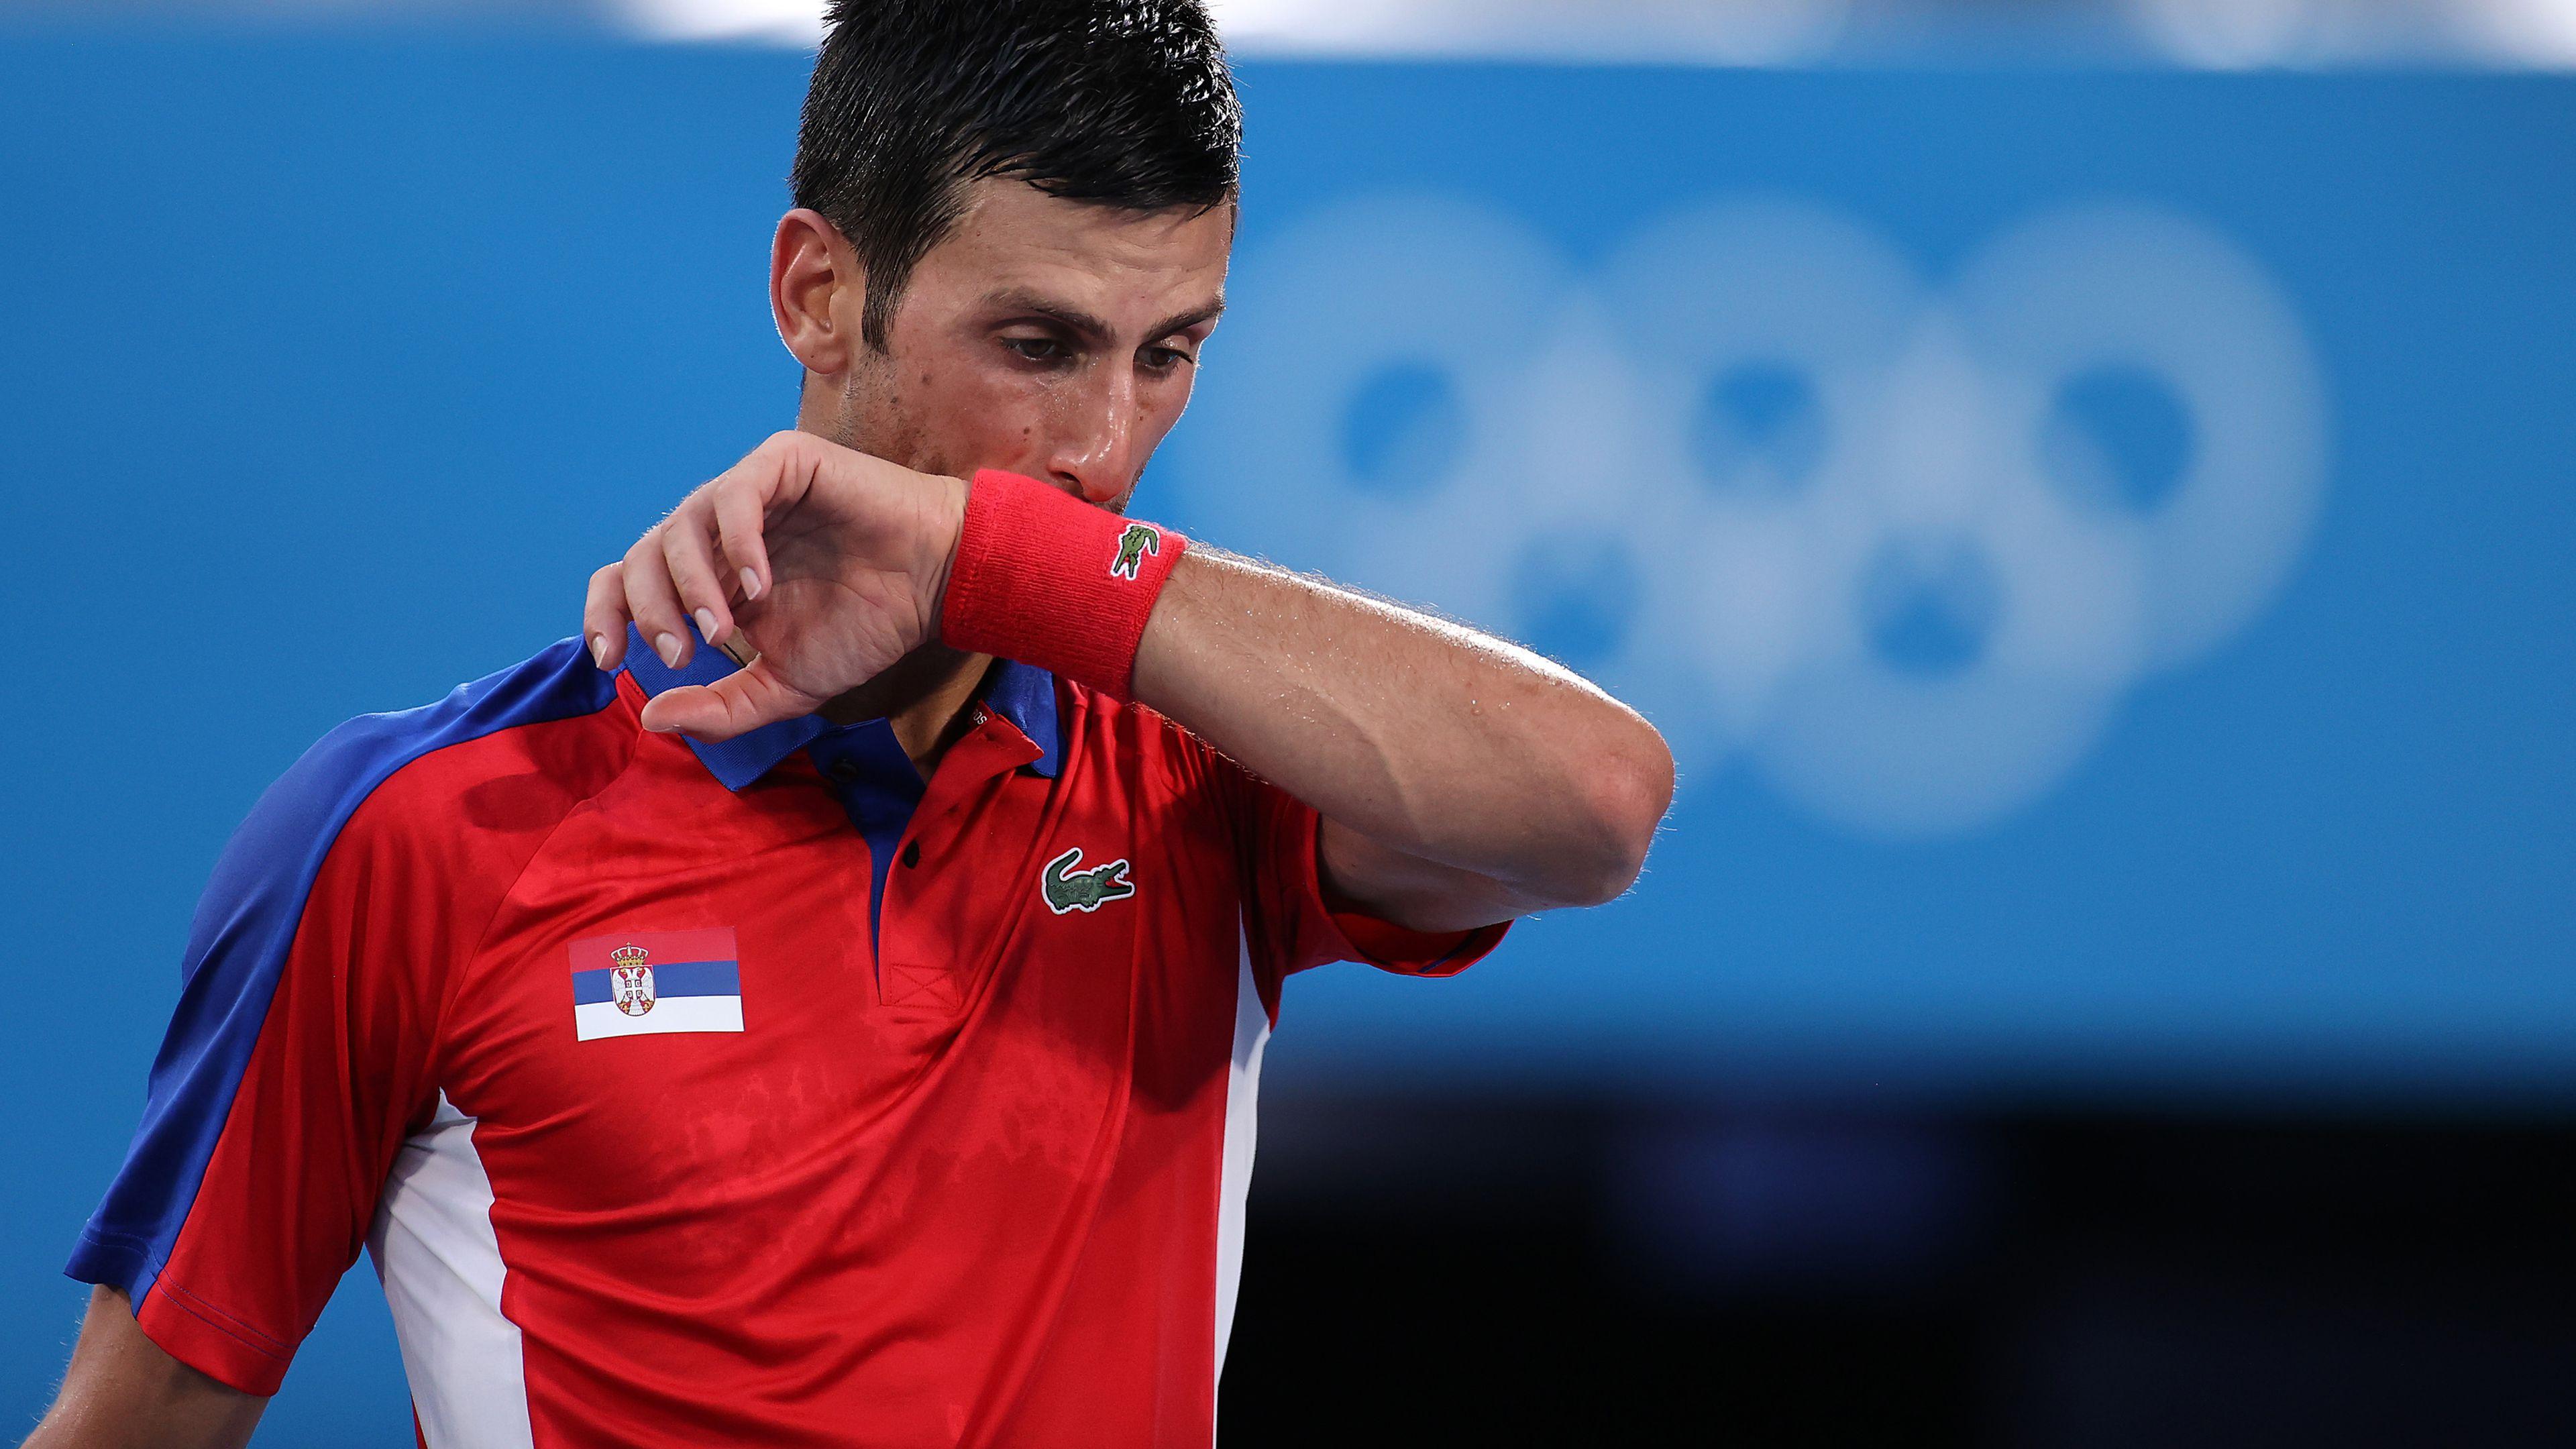 Alexander Zverev ends Novak Djokovic's hopes of a Golden Slam in 2021